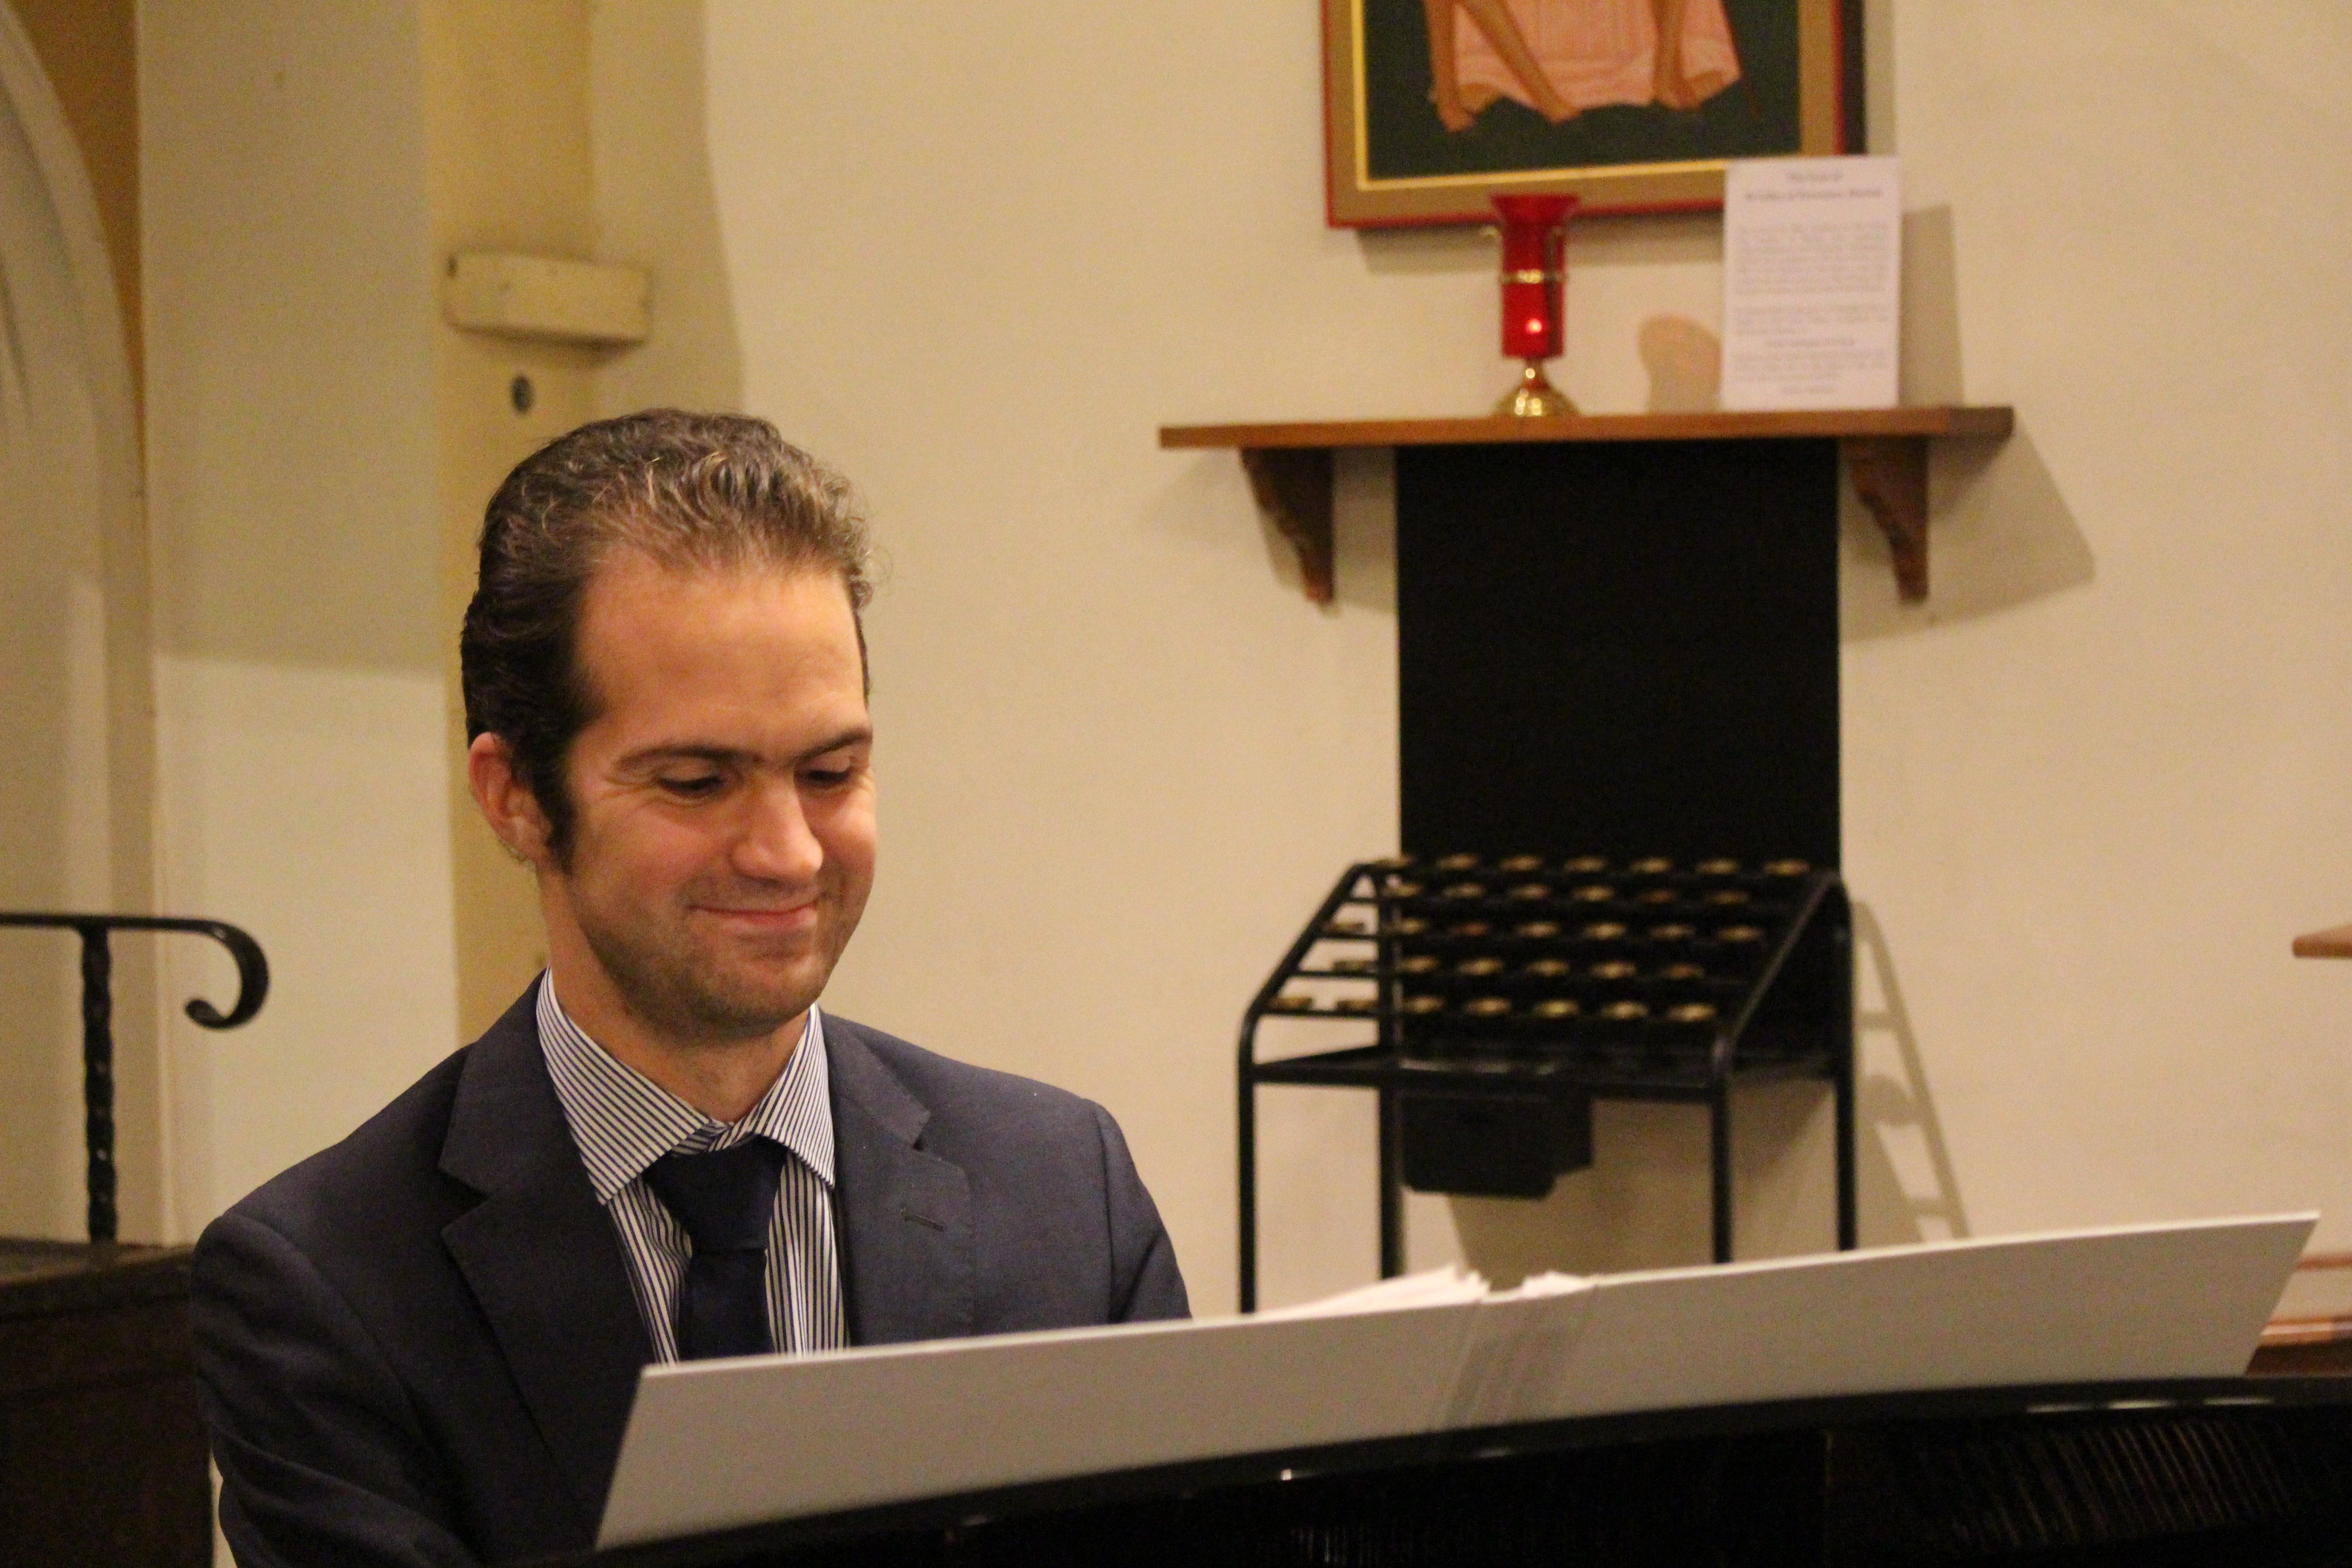 Ed, accompanist